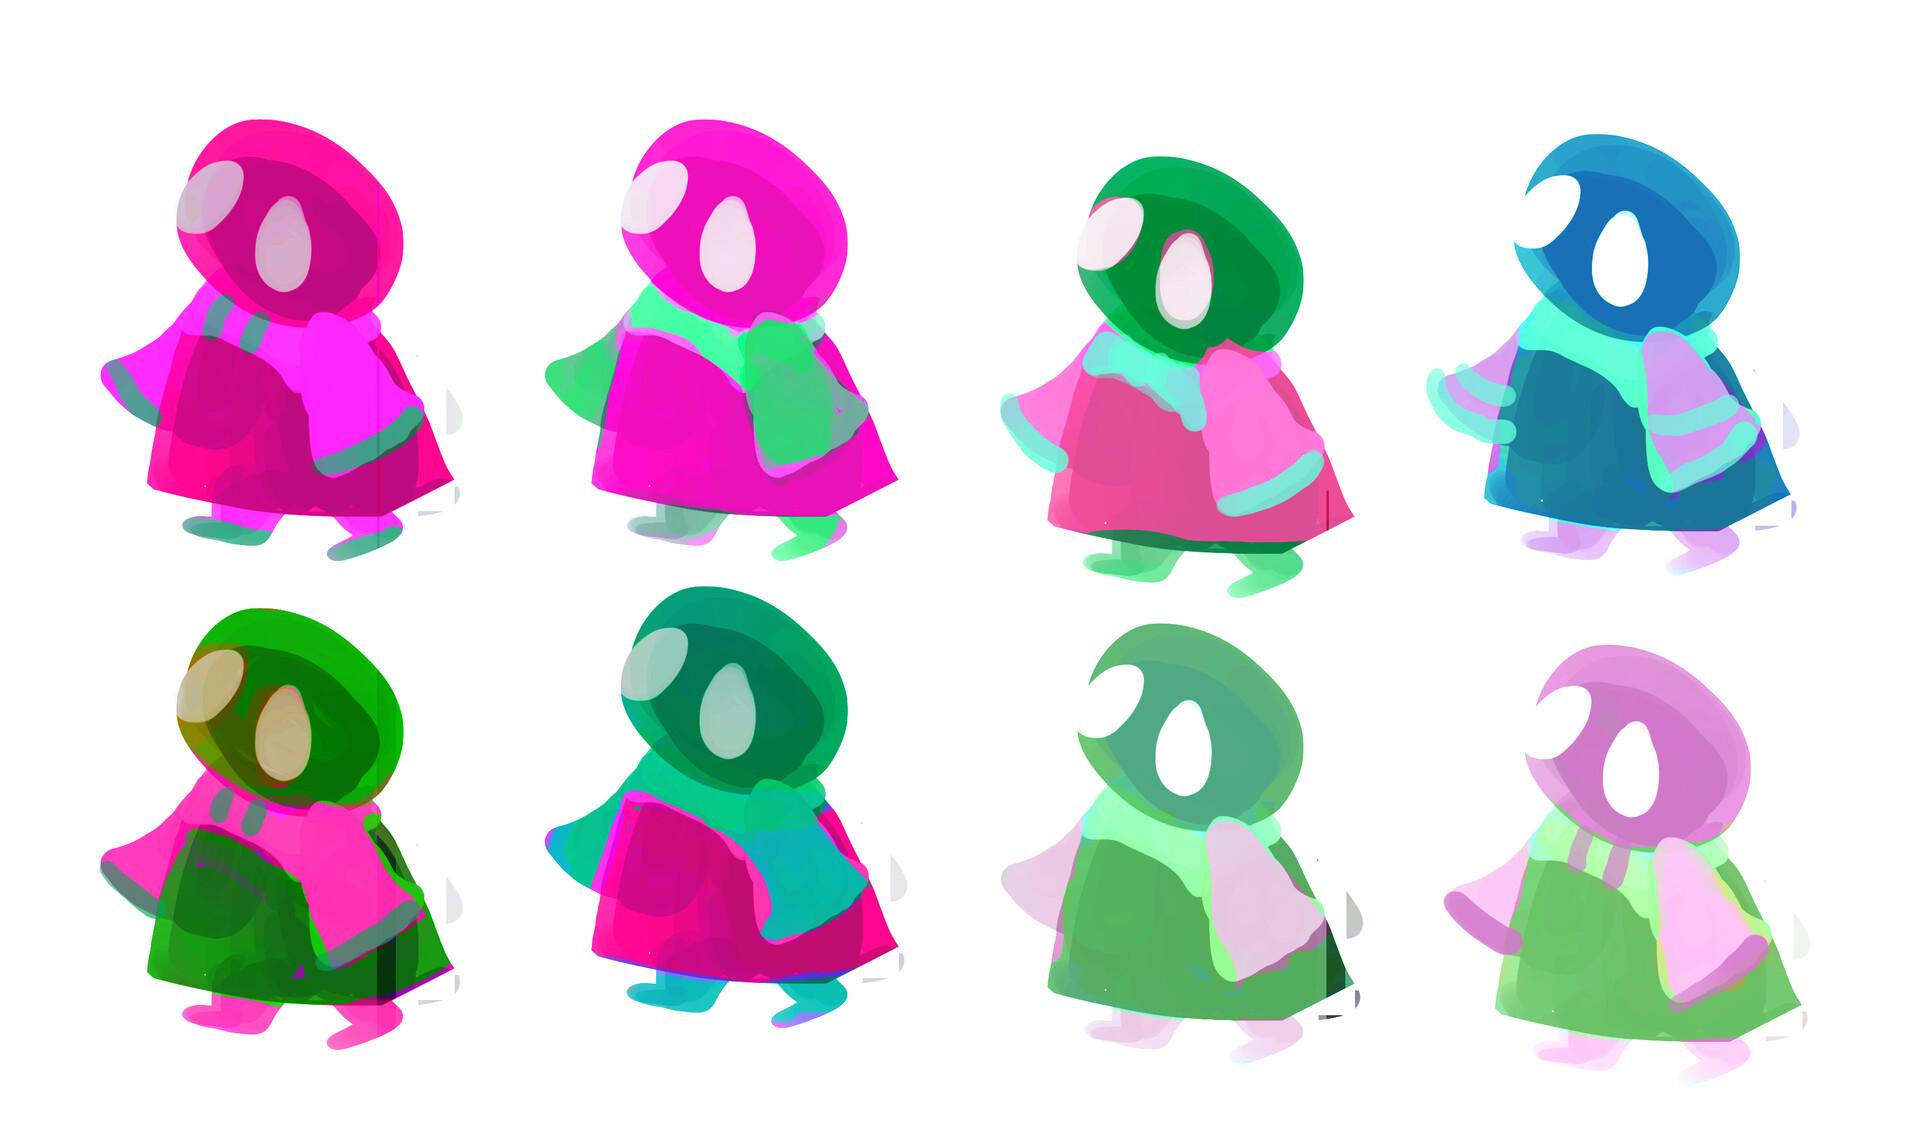 Talia olson ohc colorfulmc concepts